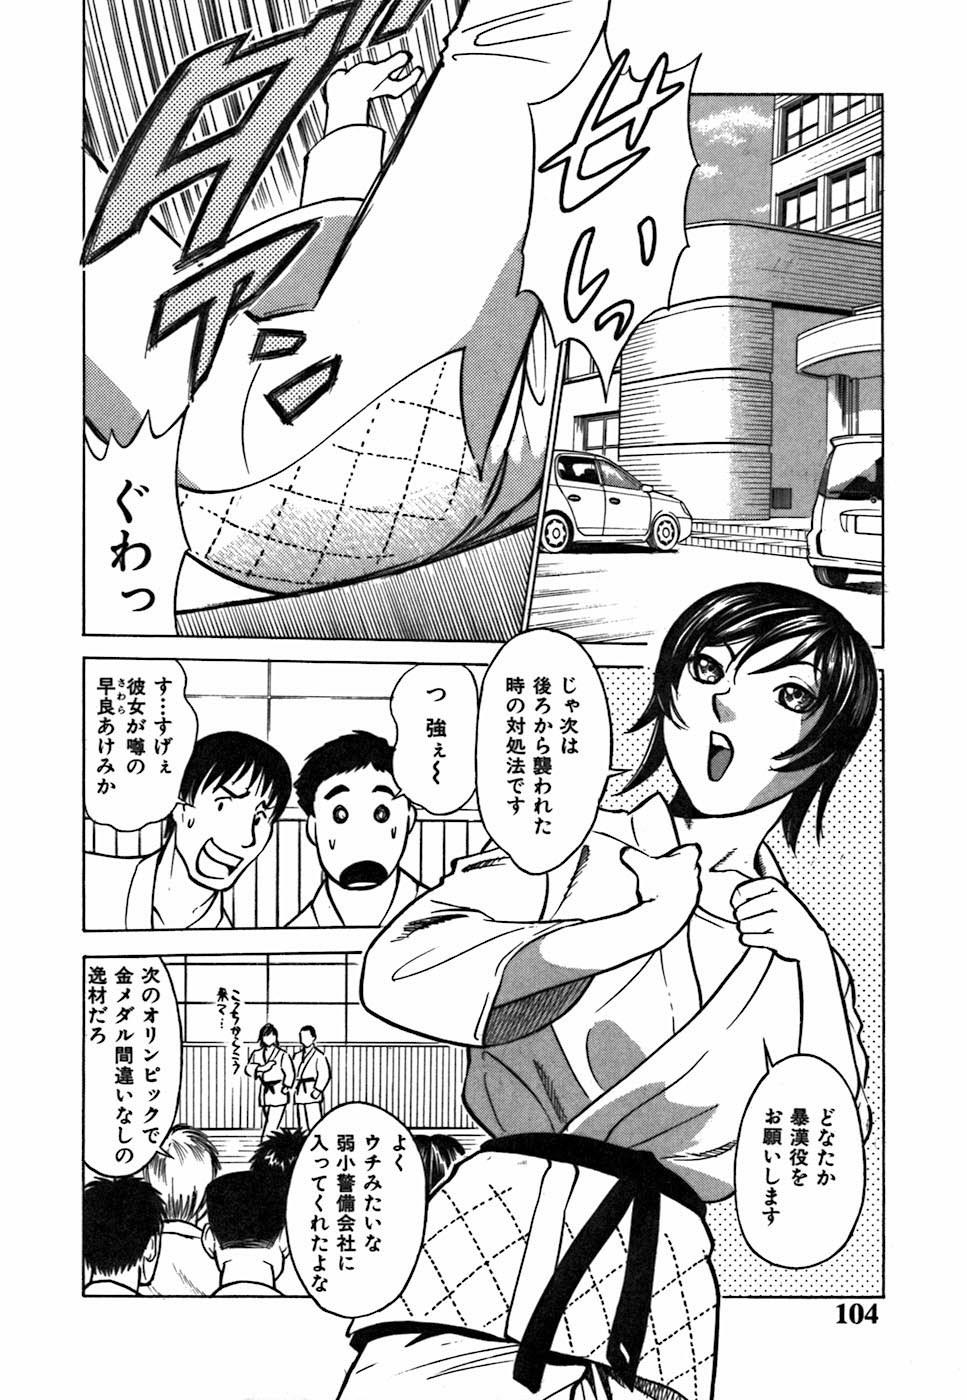 Kimi ga Nozomu Katachi | Appearance for which you hope 103